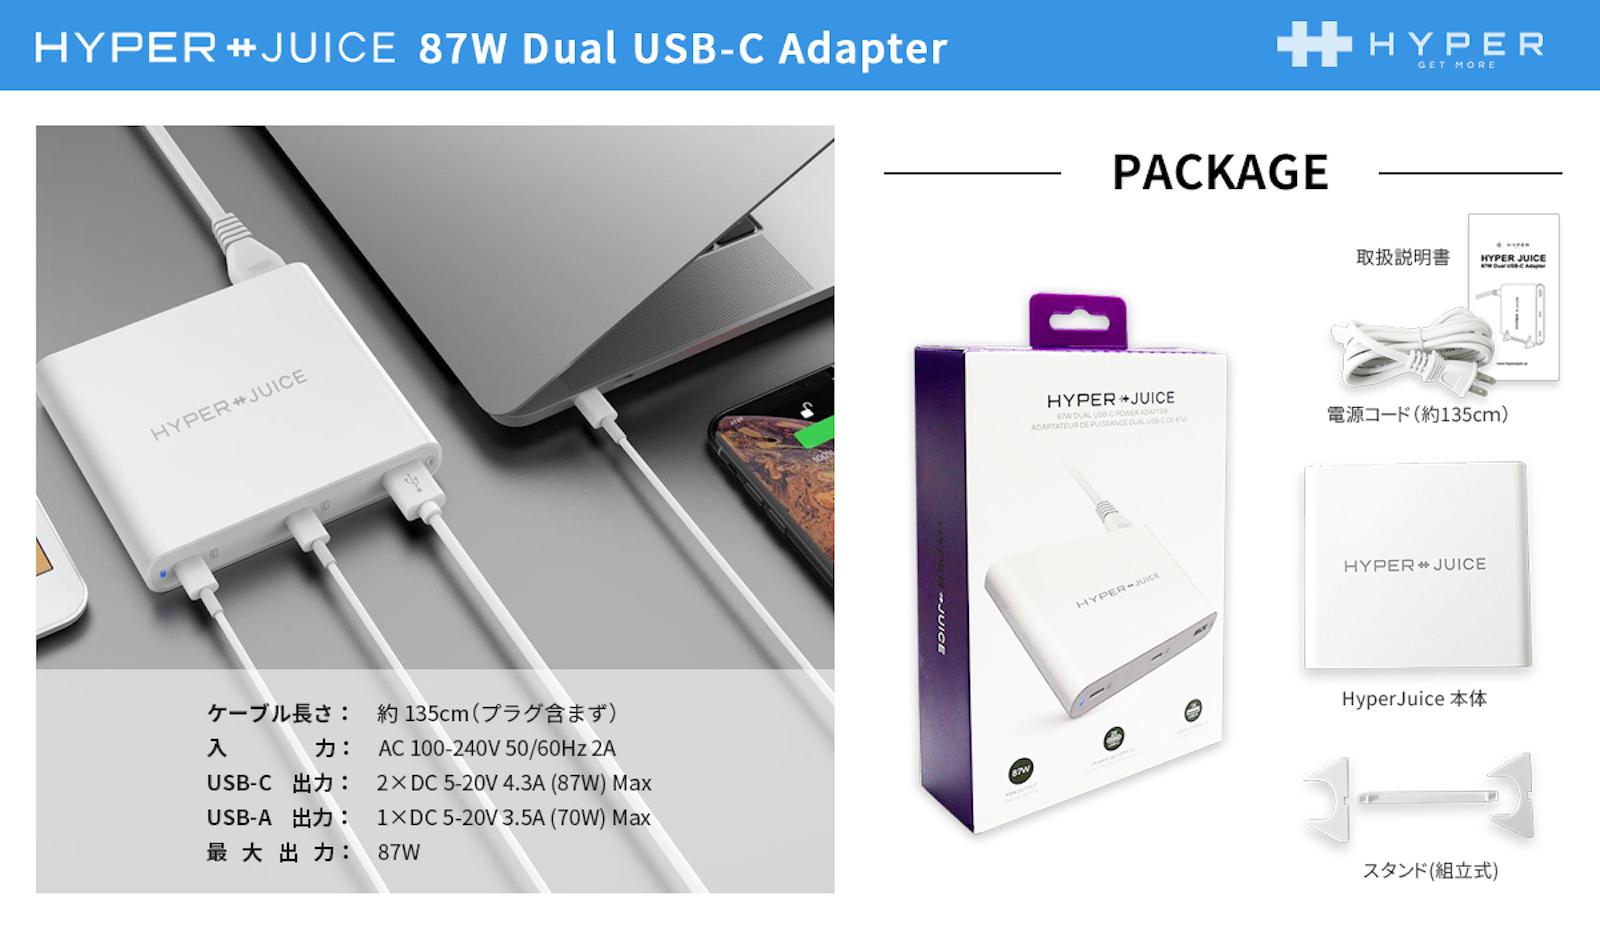 Hyperjuice 87w dual usb c adapter 3